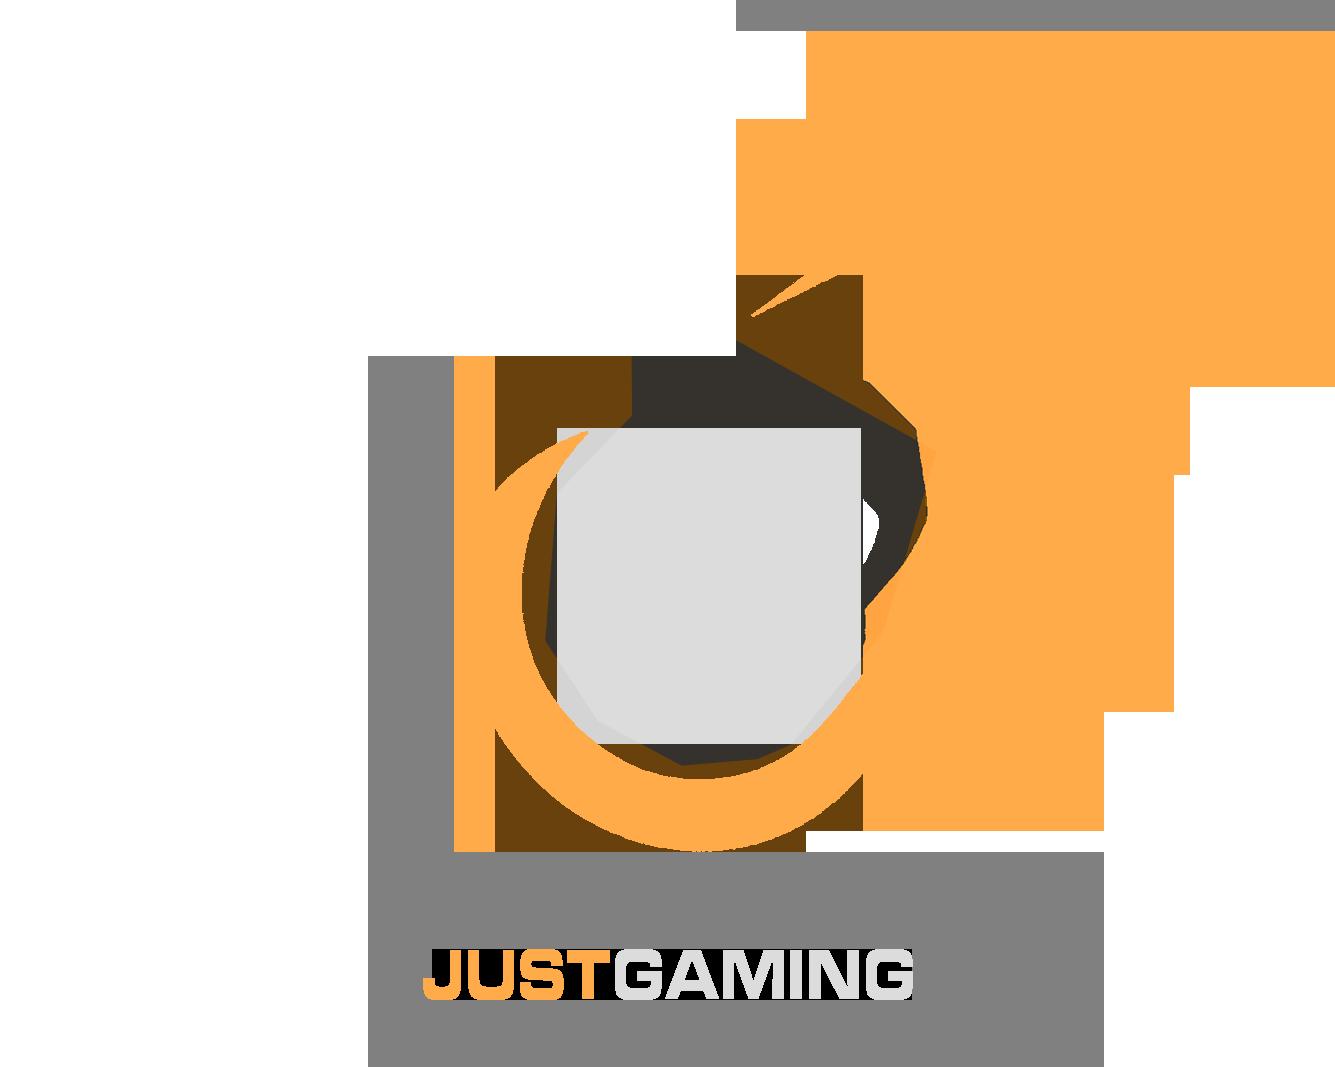 Just Gaming